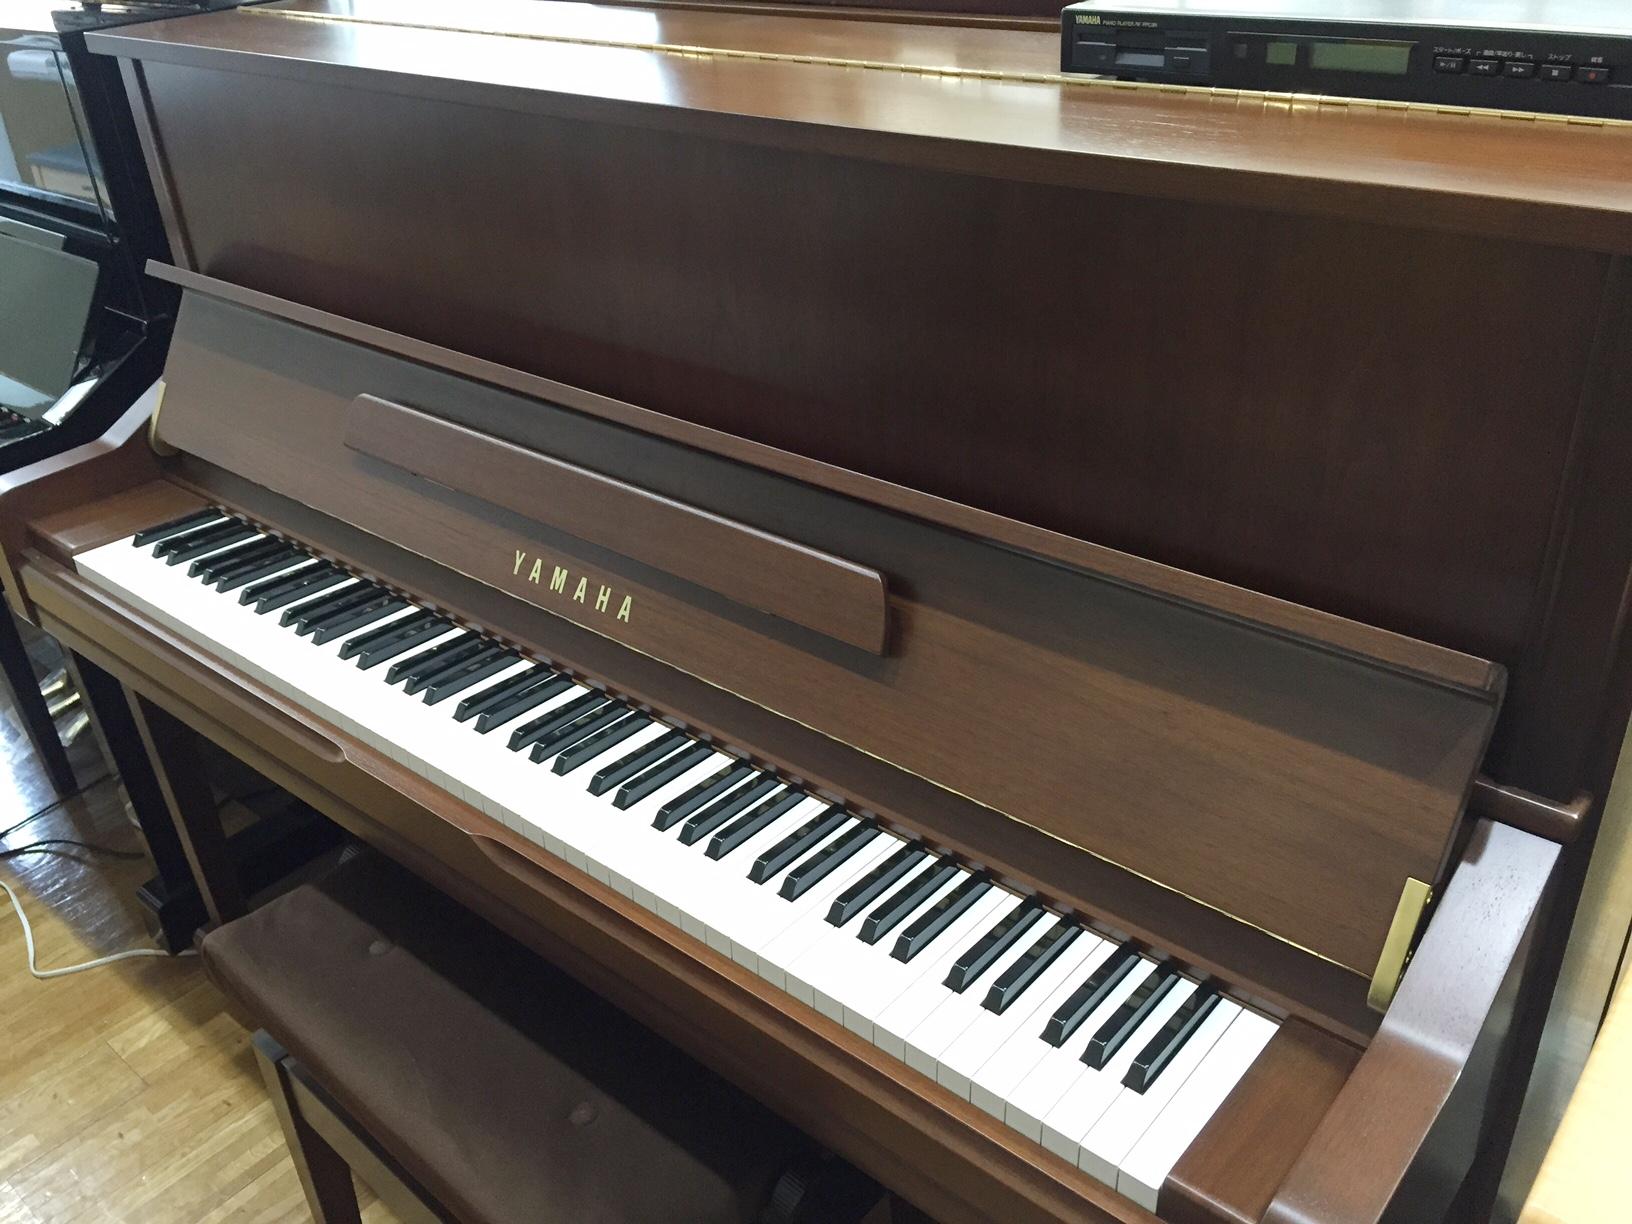 YU1Wn(ピアノプレーヤー付)